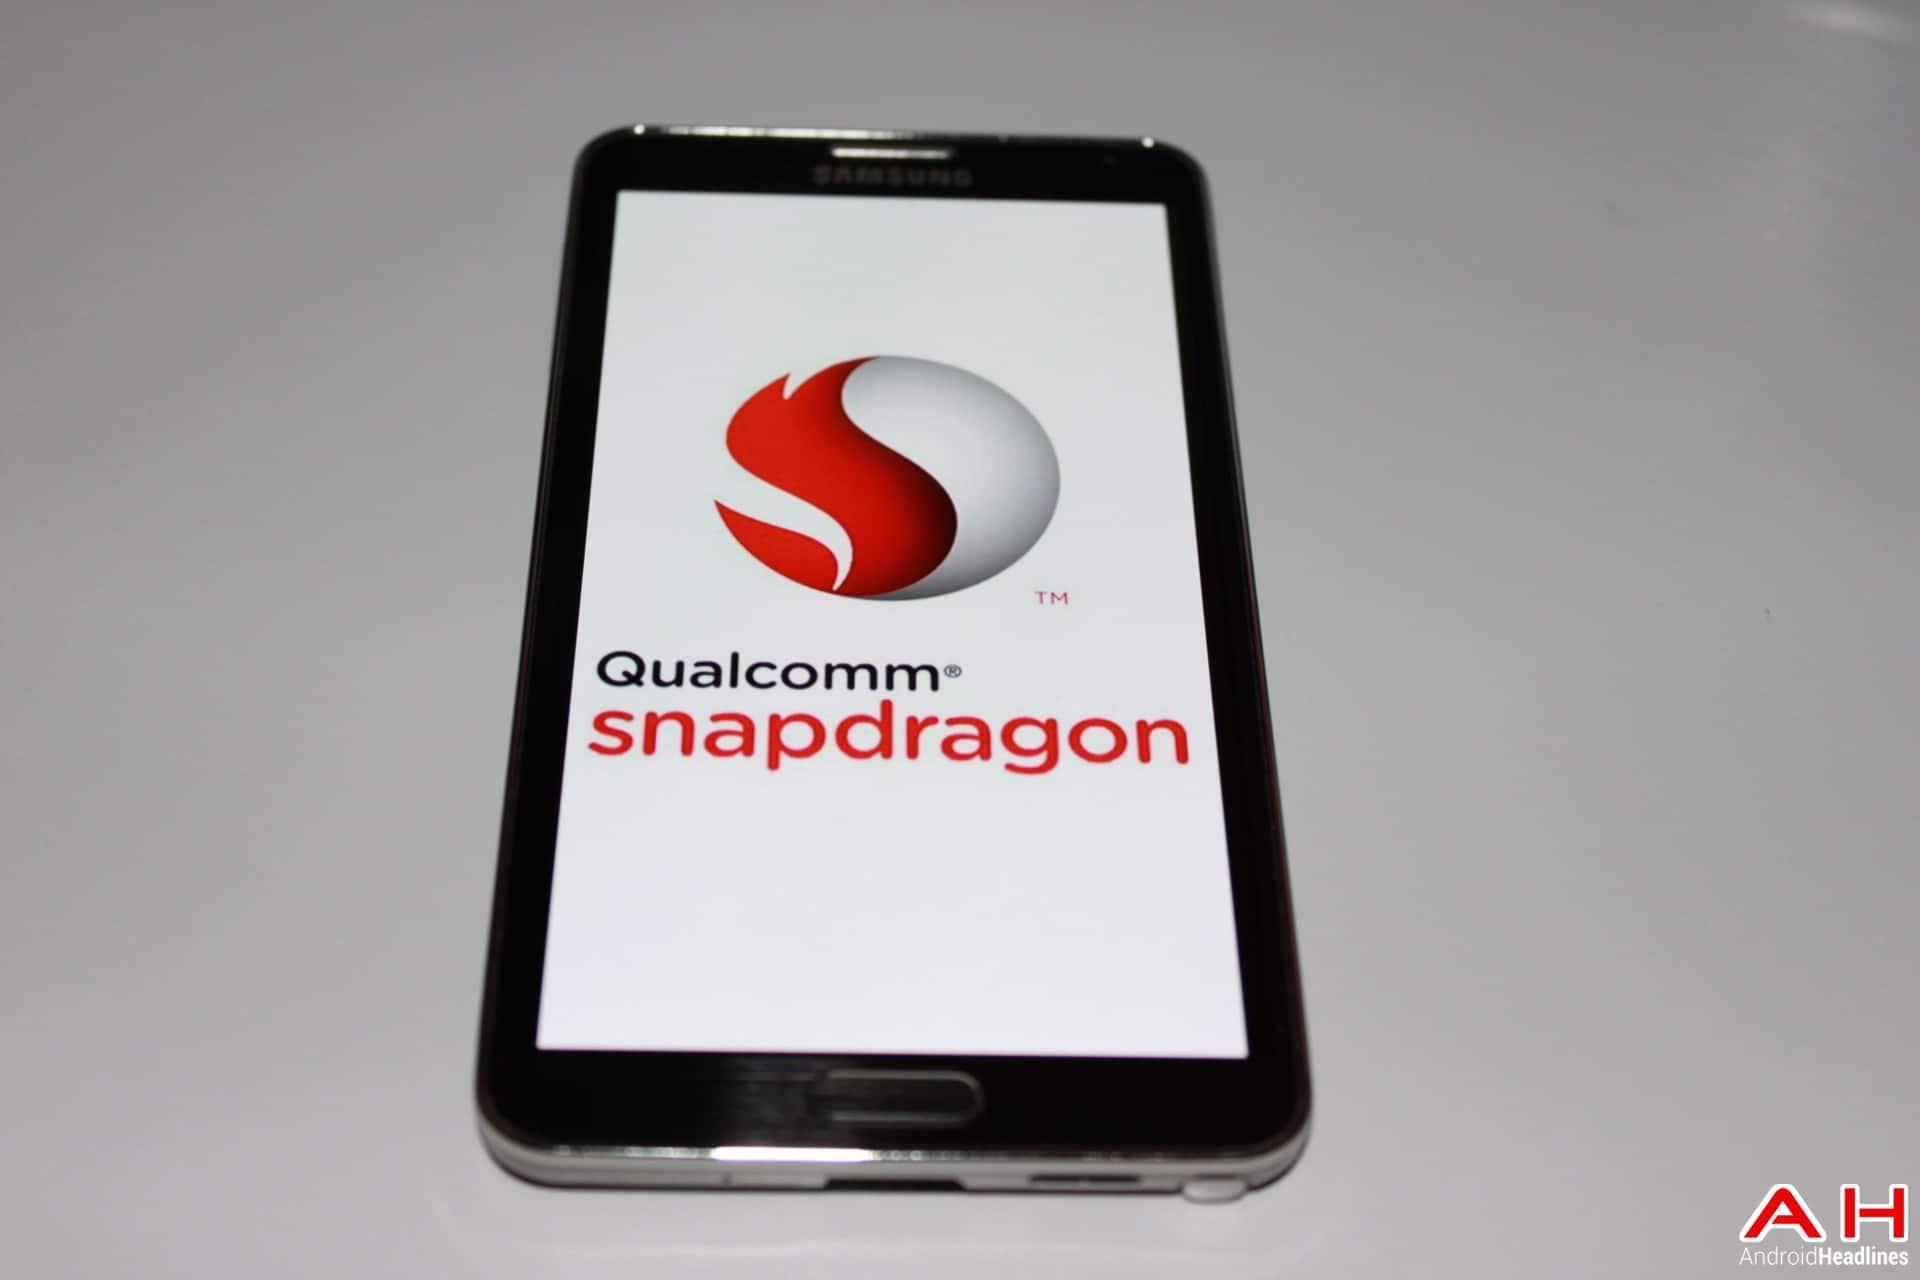 AH SnapDragon Qualcomm 1.4